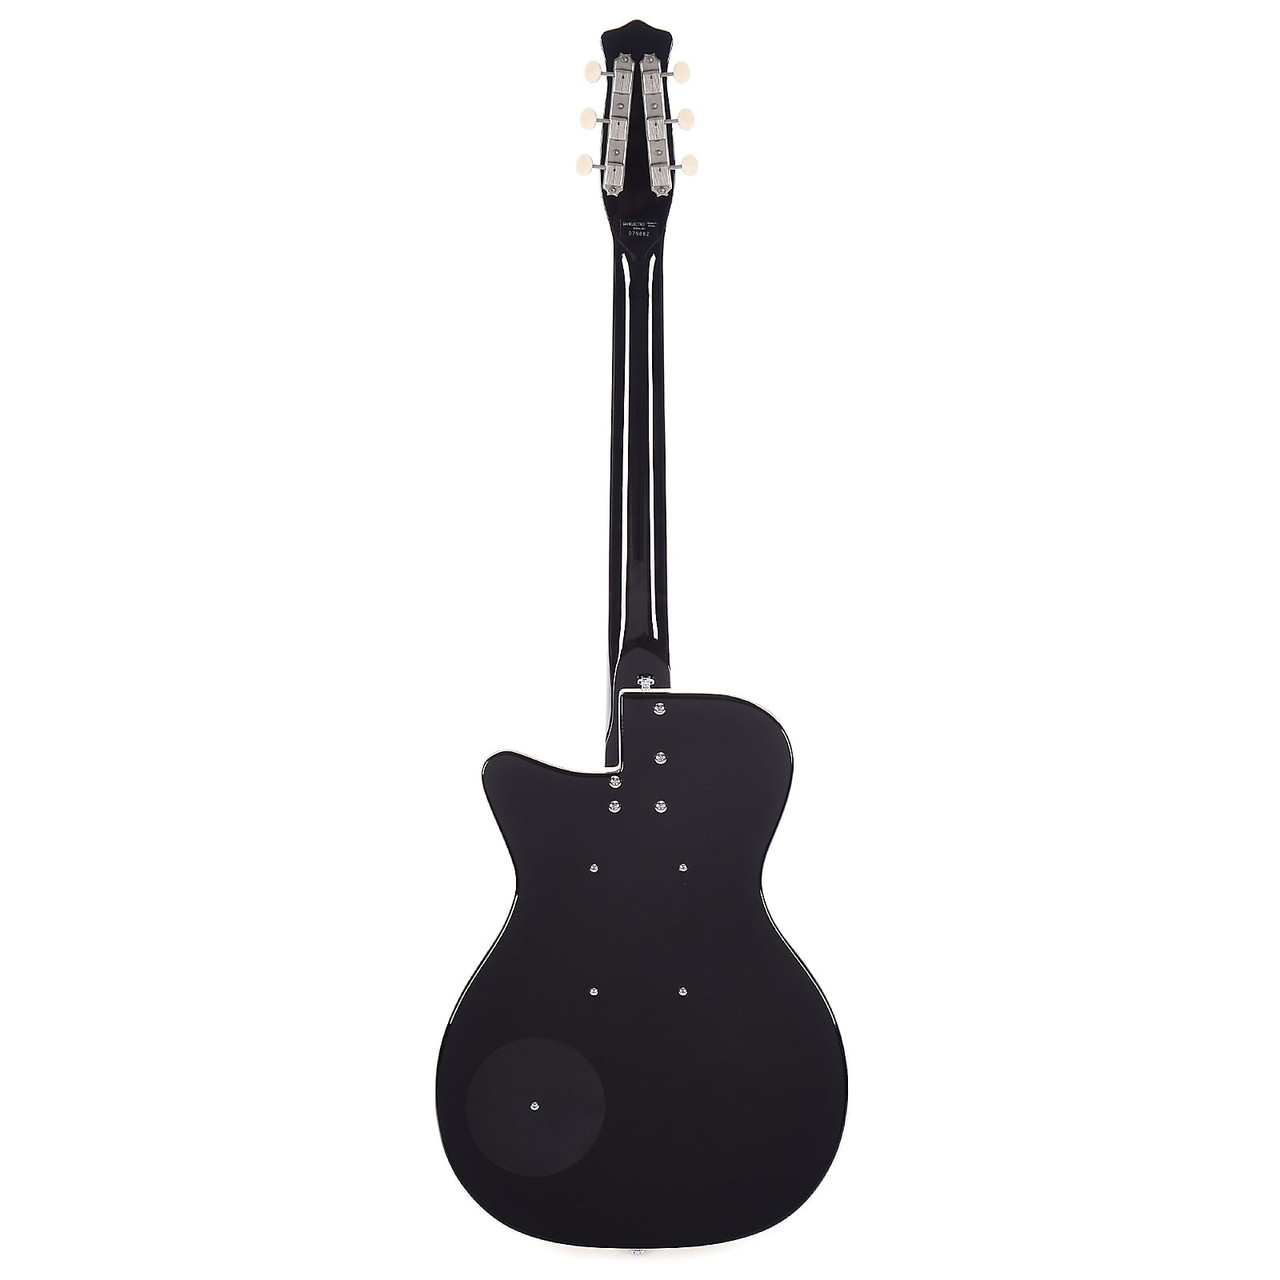 Danelectro D57JADE-BLACK Single Cutaway Shape Semi Hollow C Shape Neck 6-String Electric Guitar